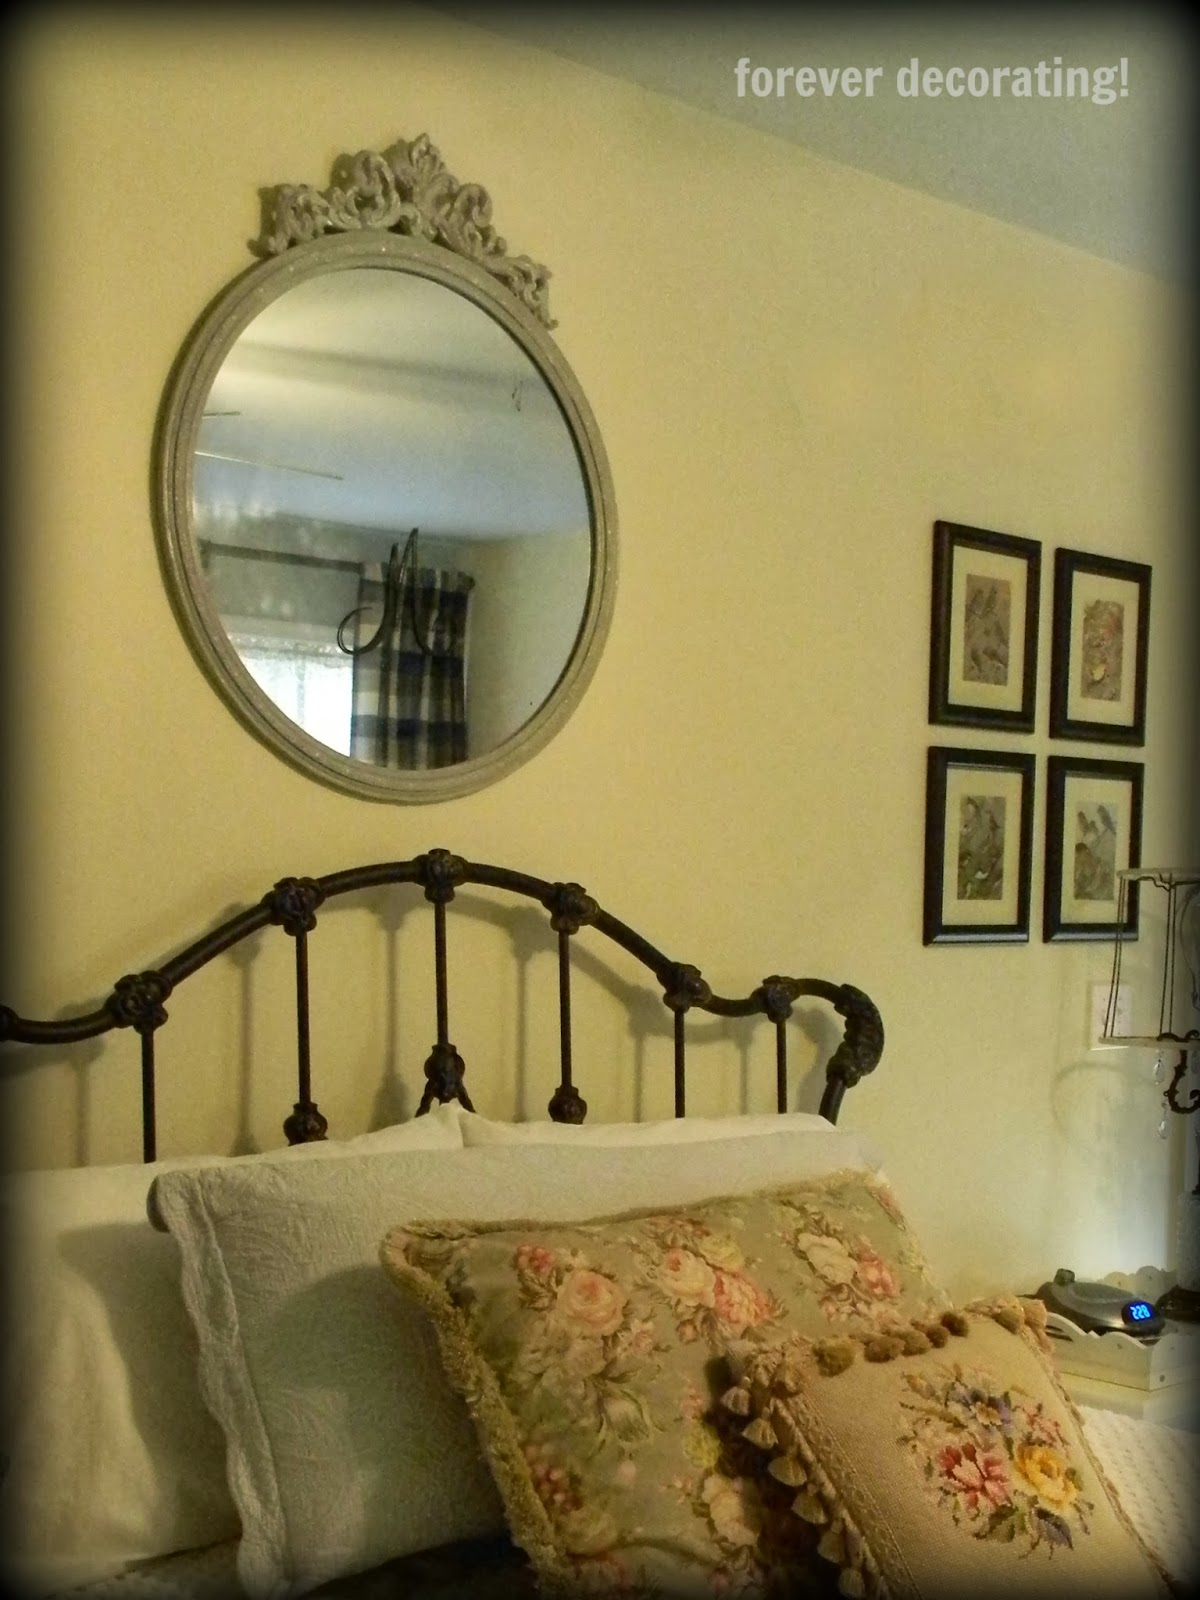 Forever Decorating!: Round Mirror Love